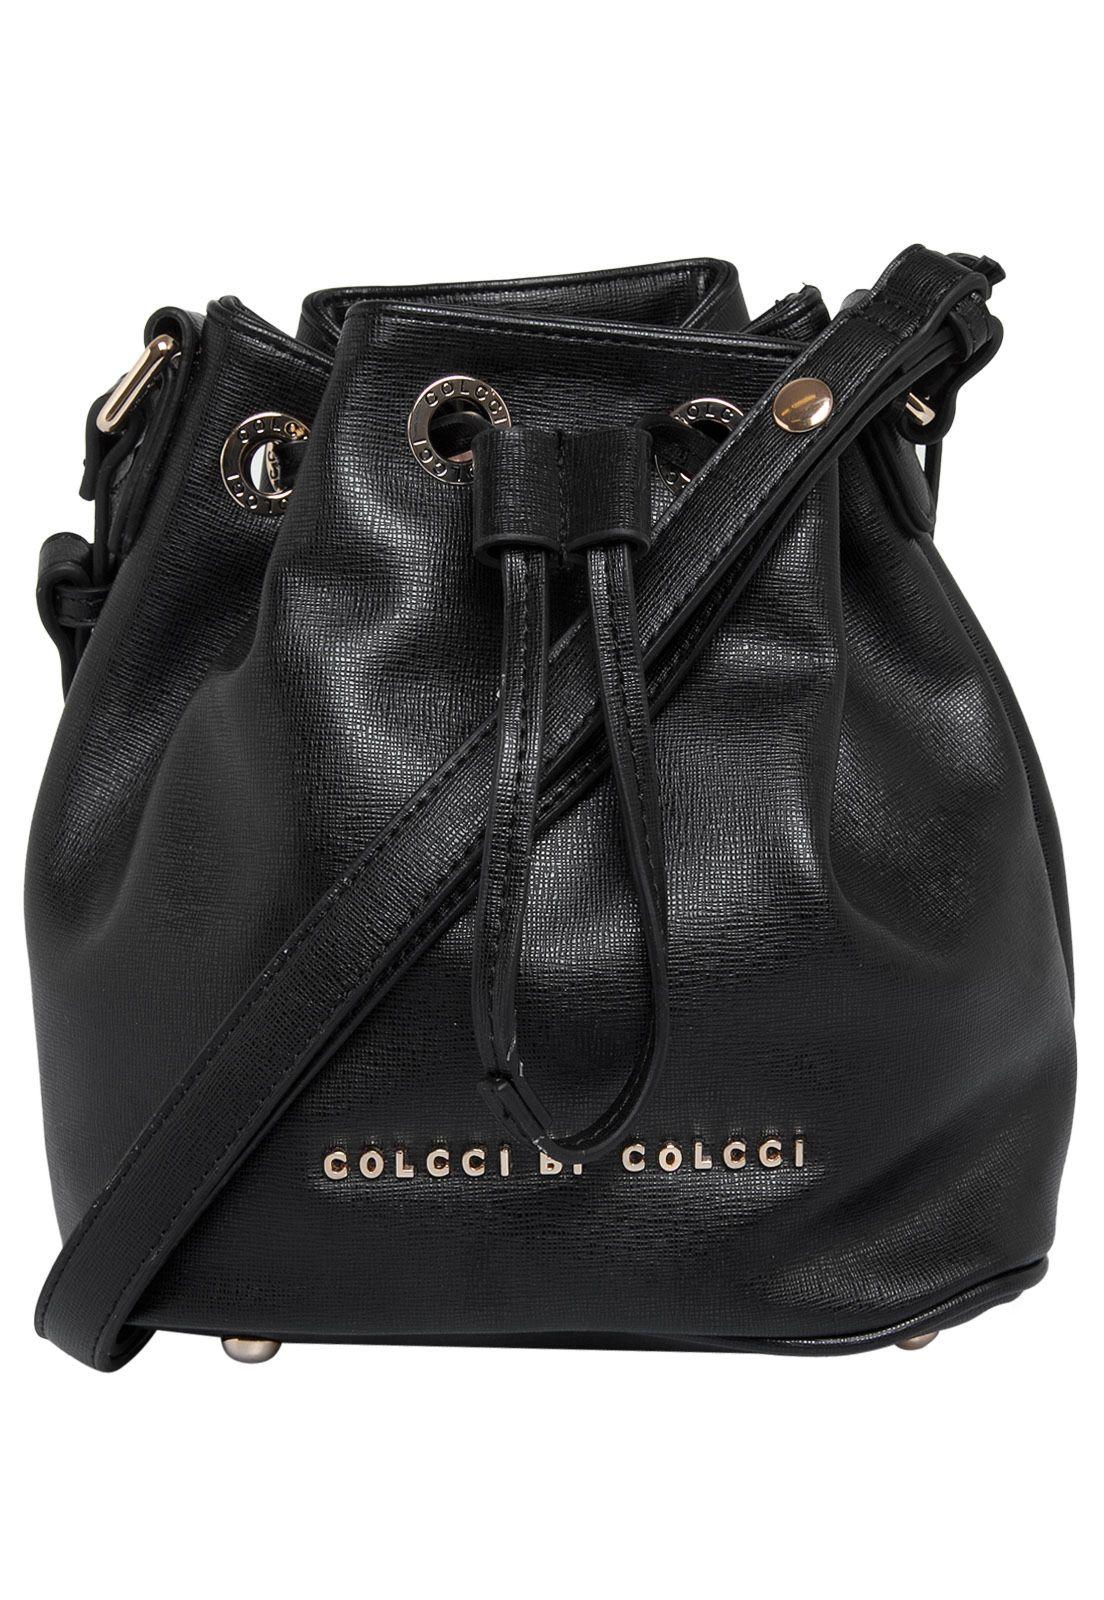 b8e0a817f Bolsa Colcci Cordão Preta | Colcci | Bags, Fashion bags e Fashion